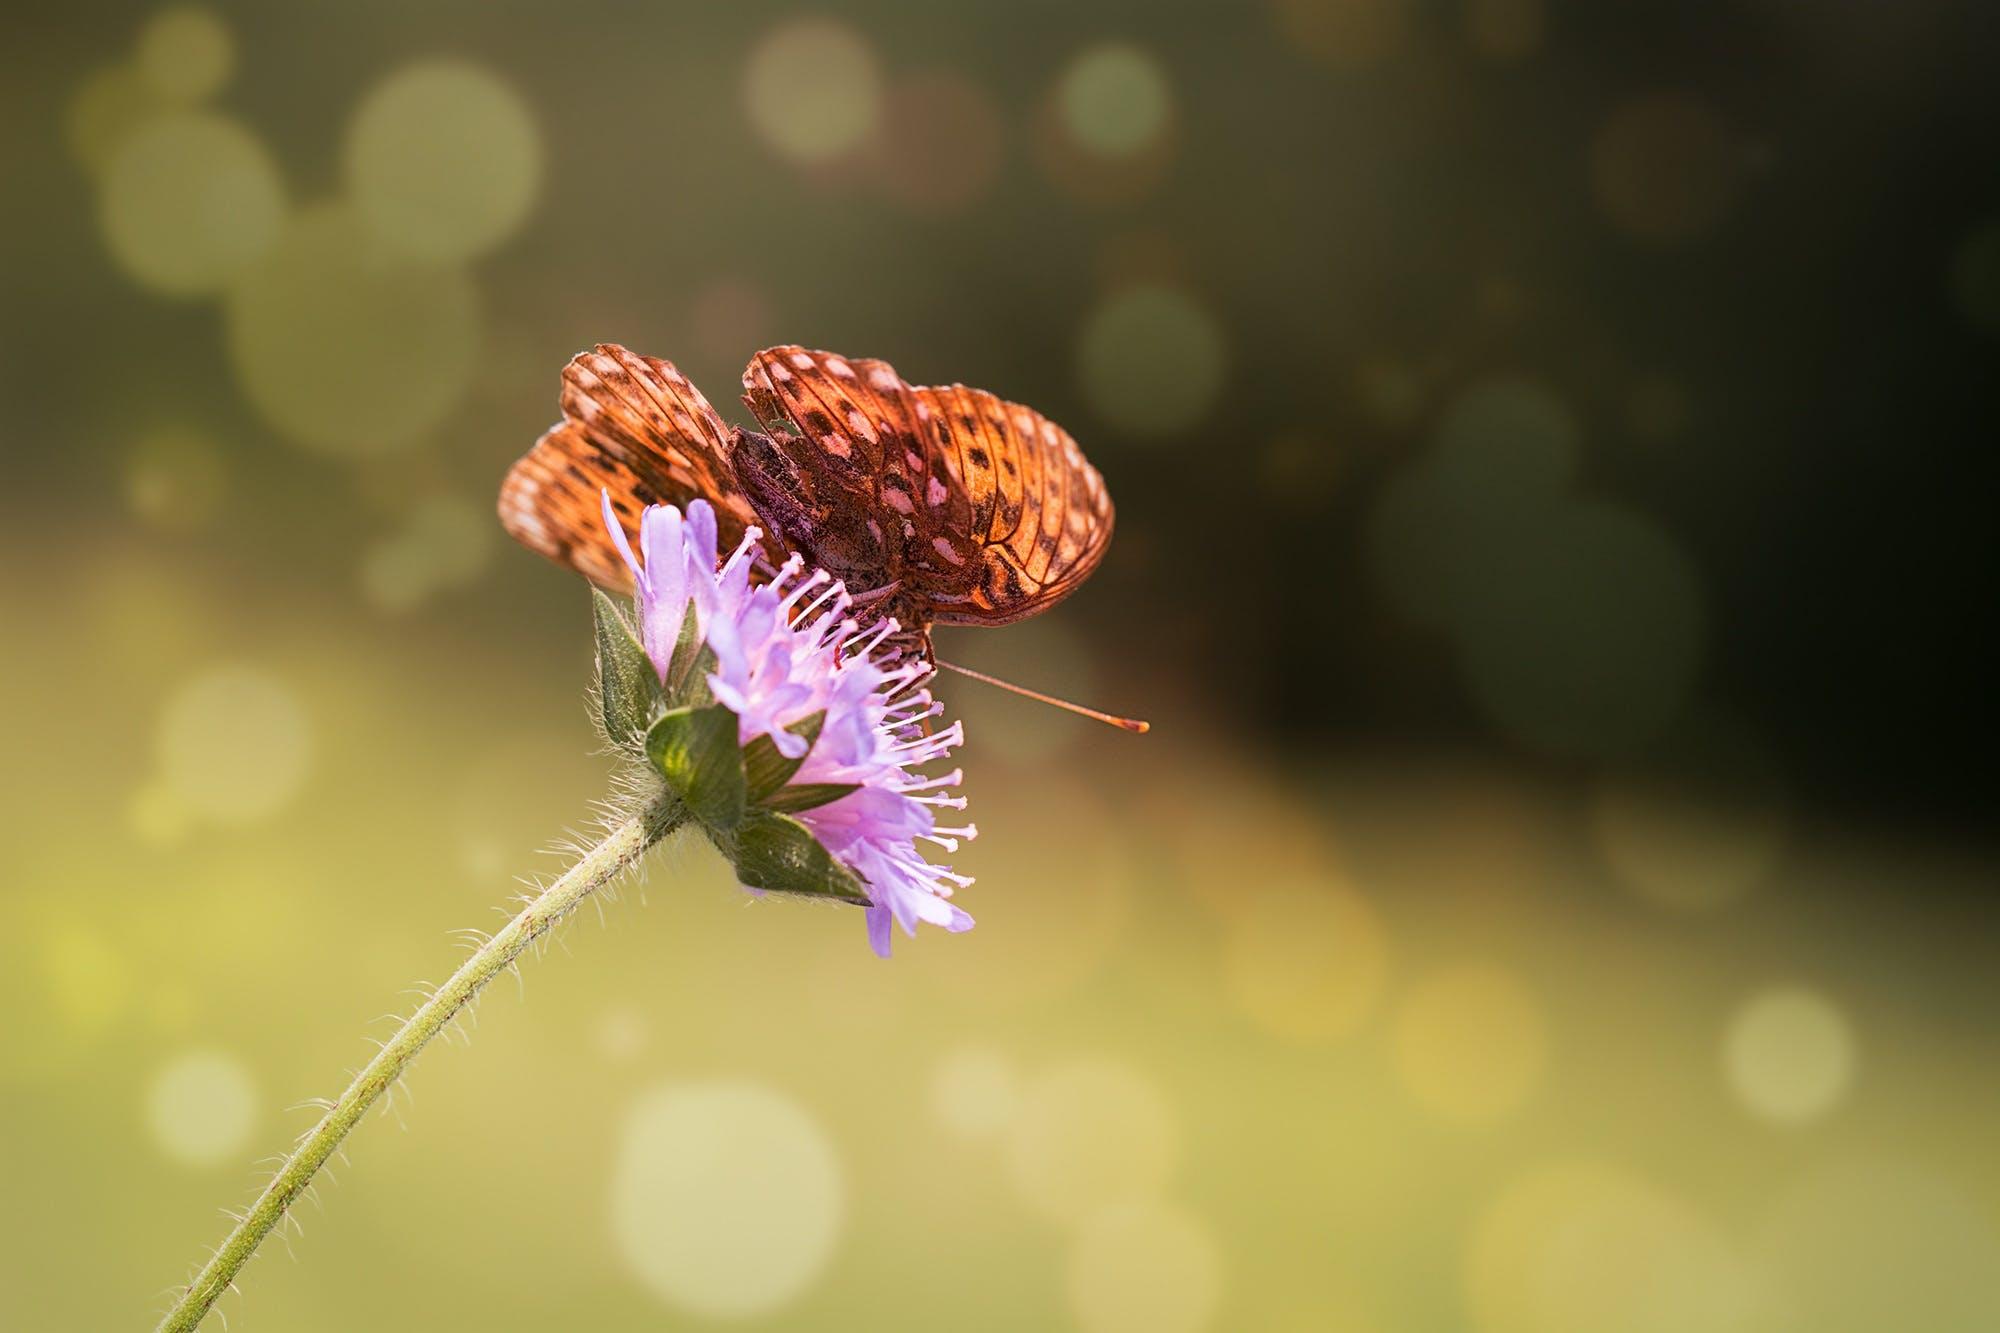 Free stock photo of nature, summer, animal, flower